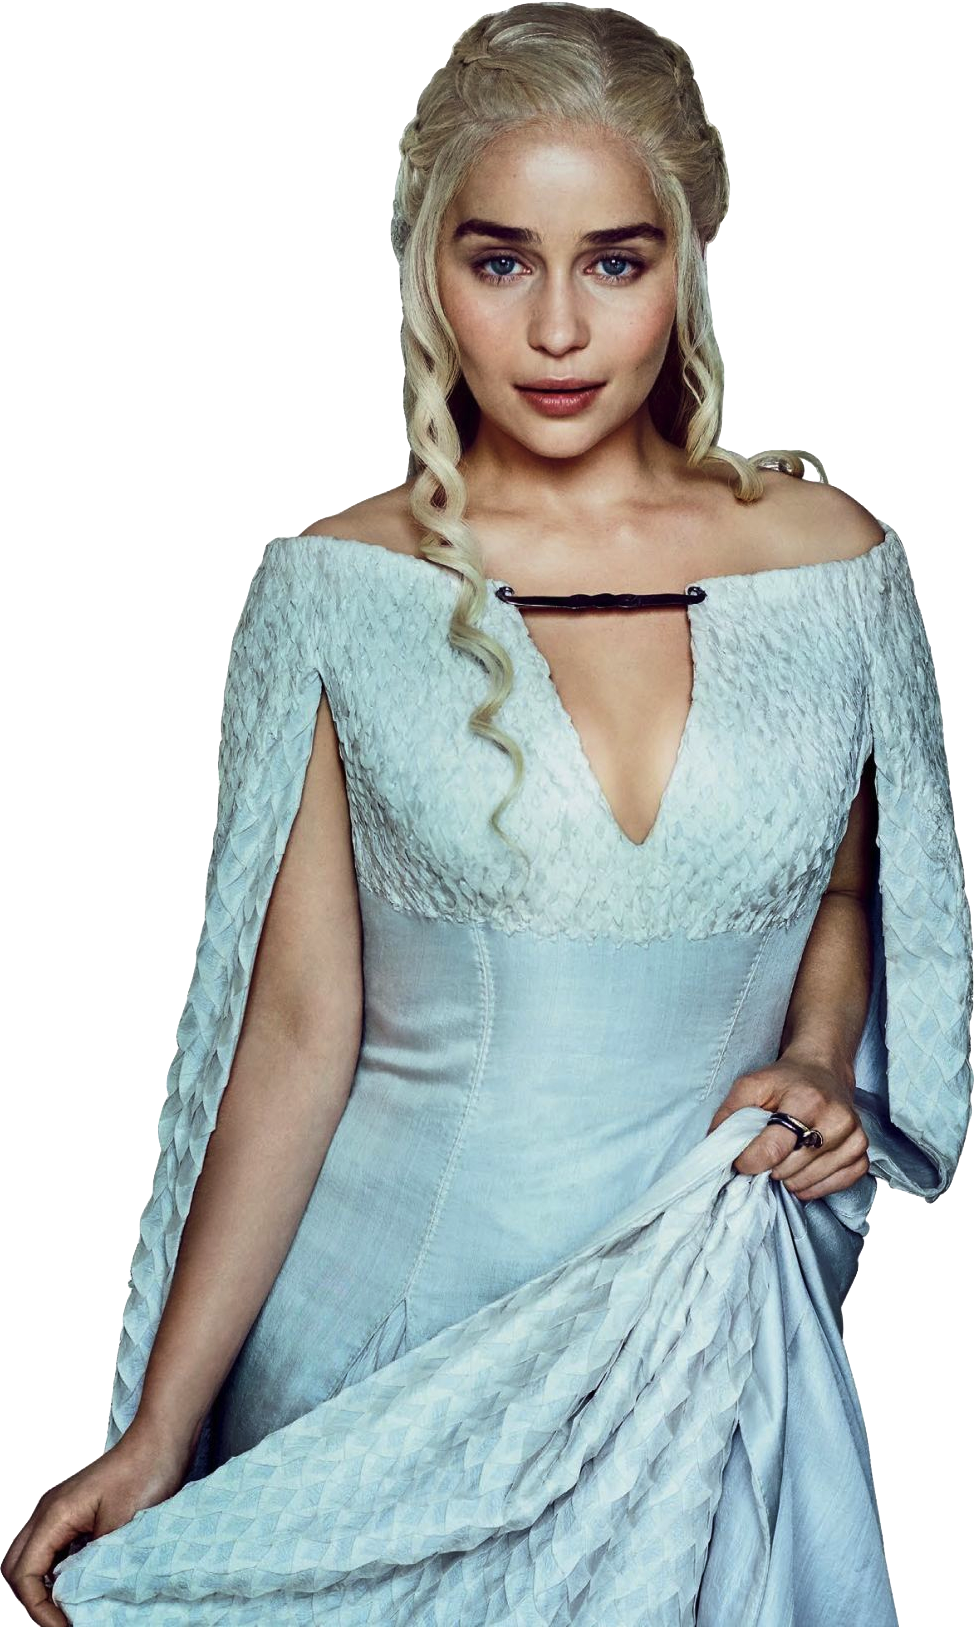 Daenerys Targaryen Got Ew Png Mother Of Dragons Game Of Thrones Girl Emilia Clarke